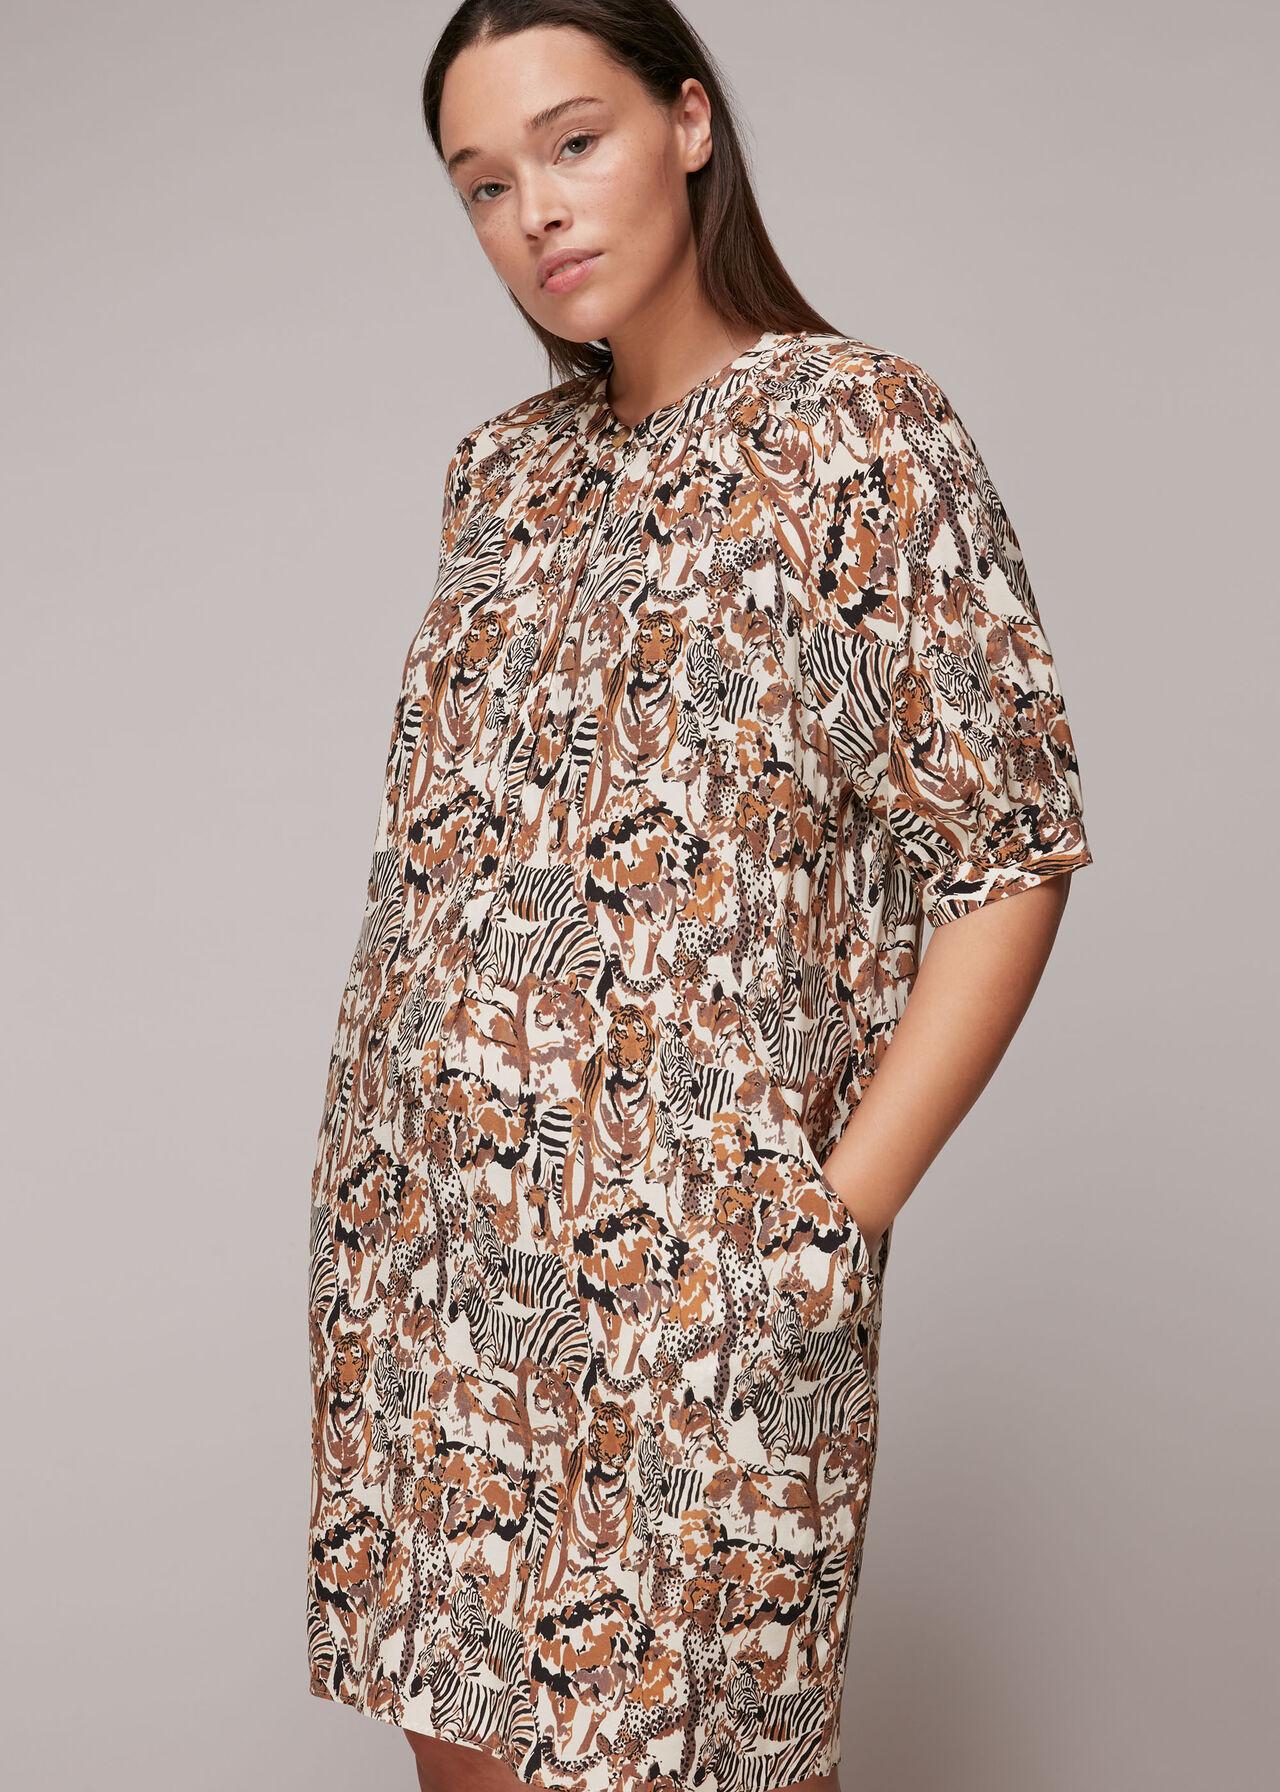 Camo Safari Print Dress